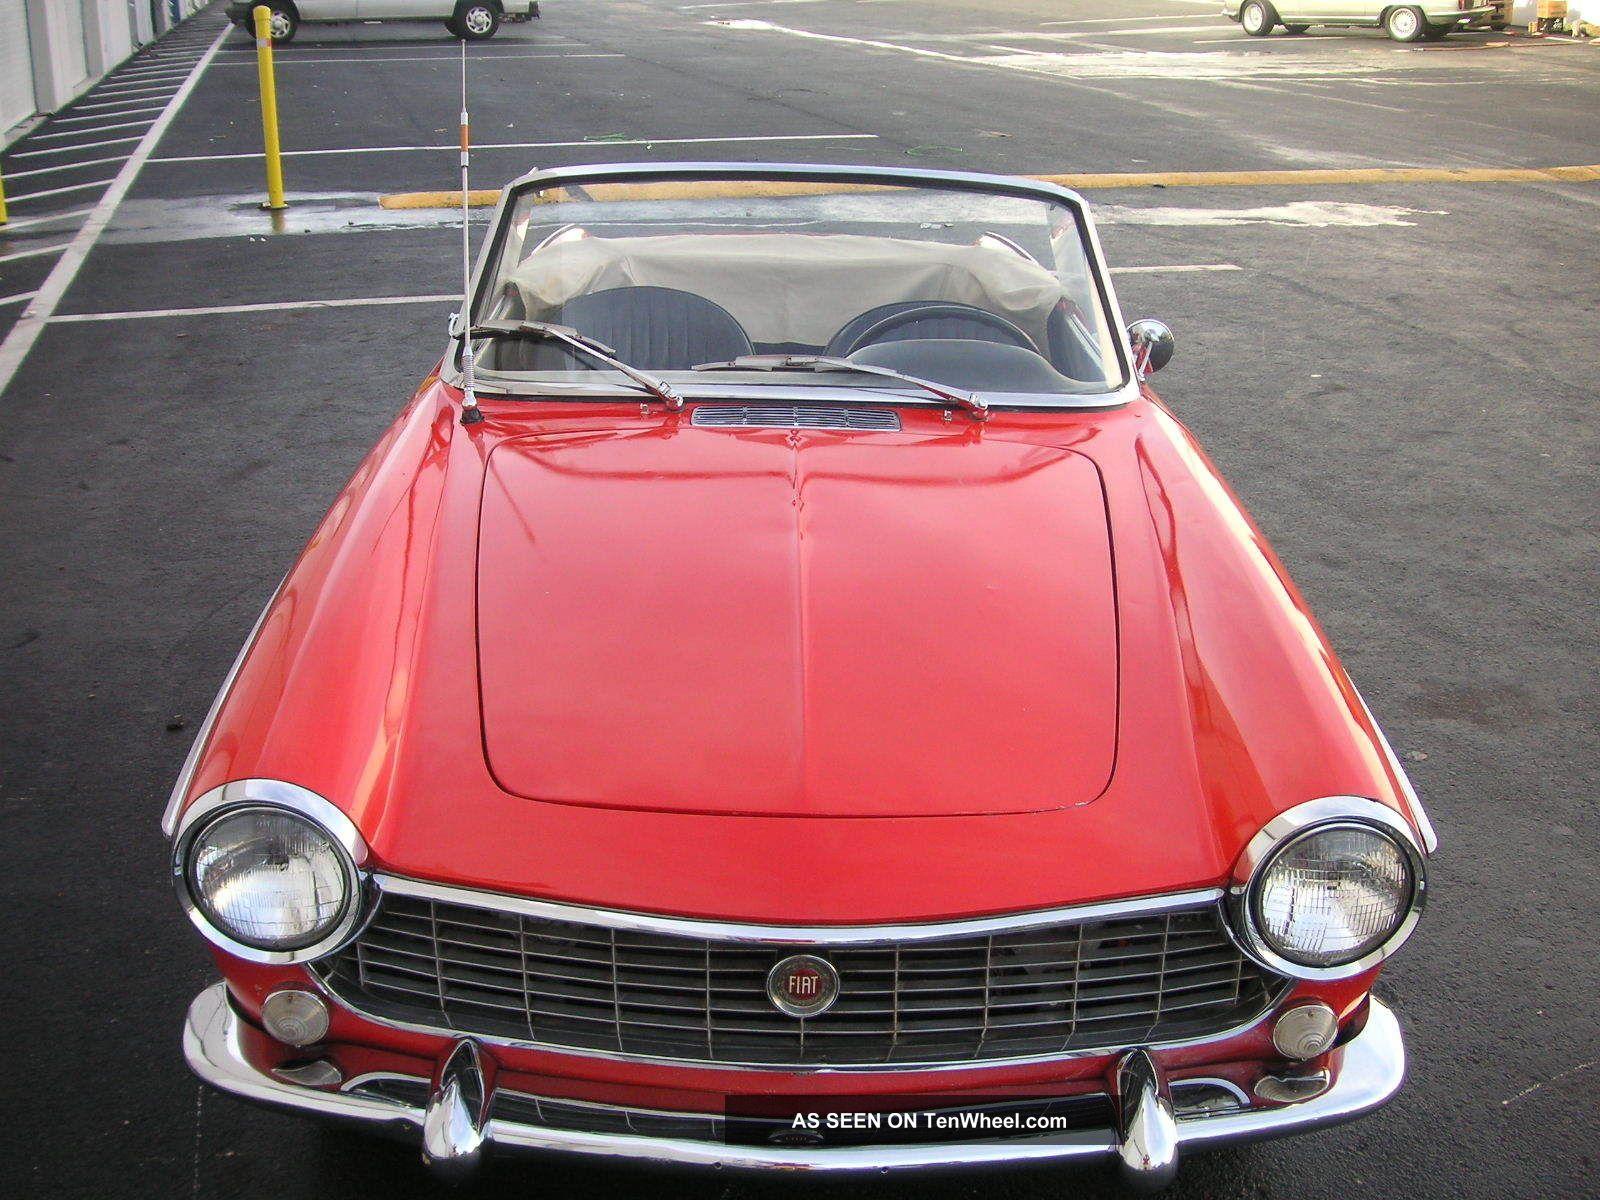 1967 fiat 1500 pininfarina cabriolet. Black Bedroom Furniture Sets. Home Design Ideas